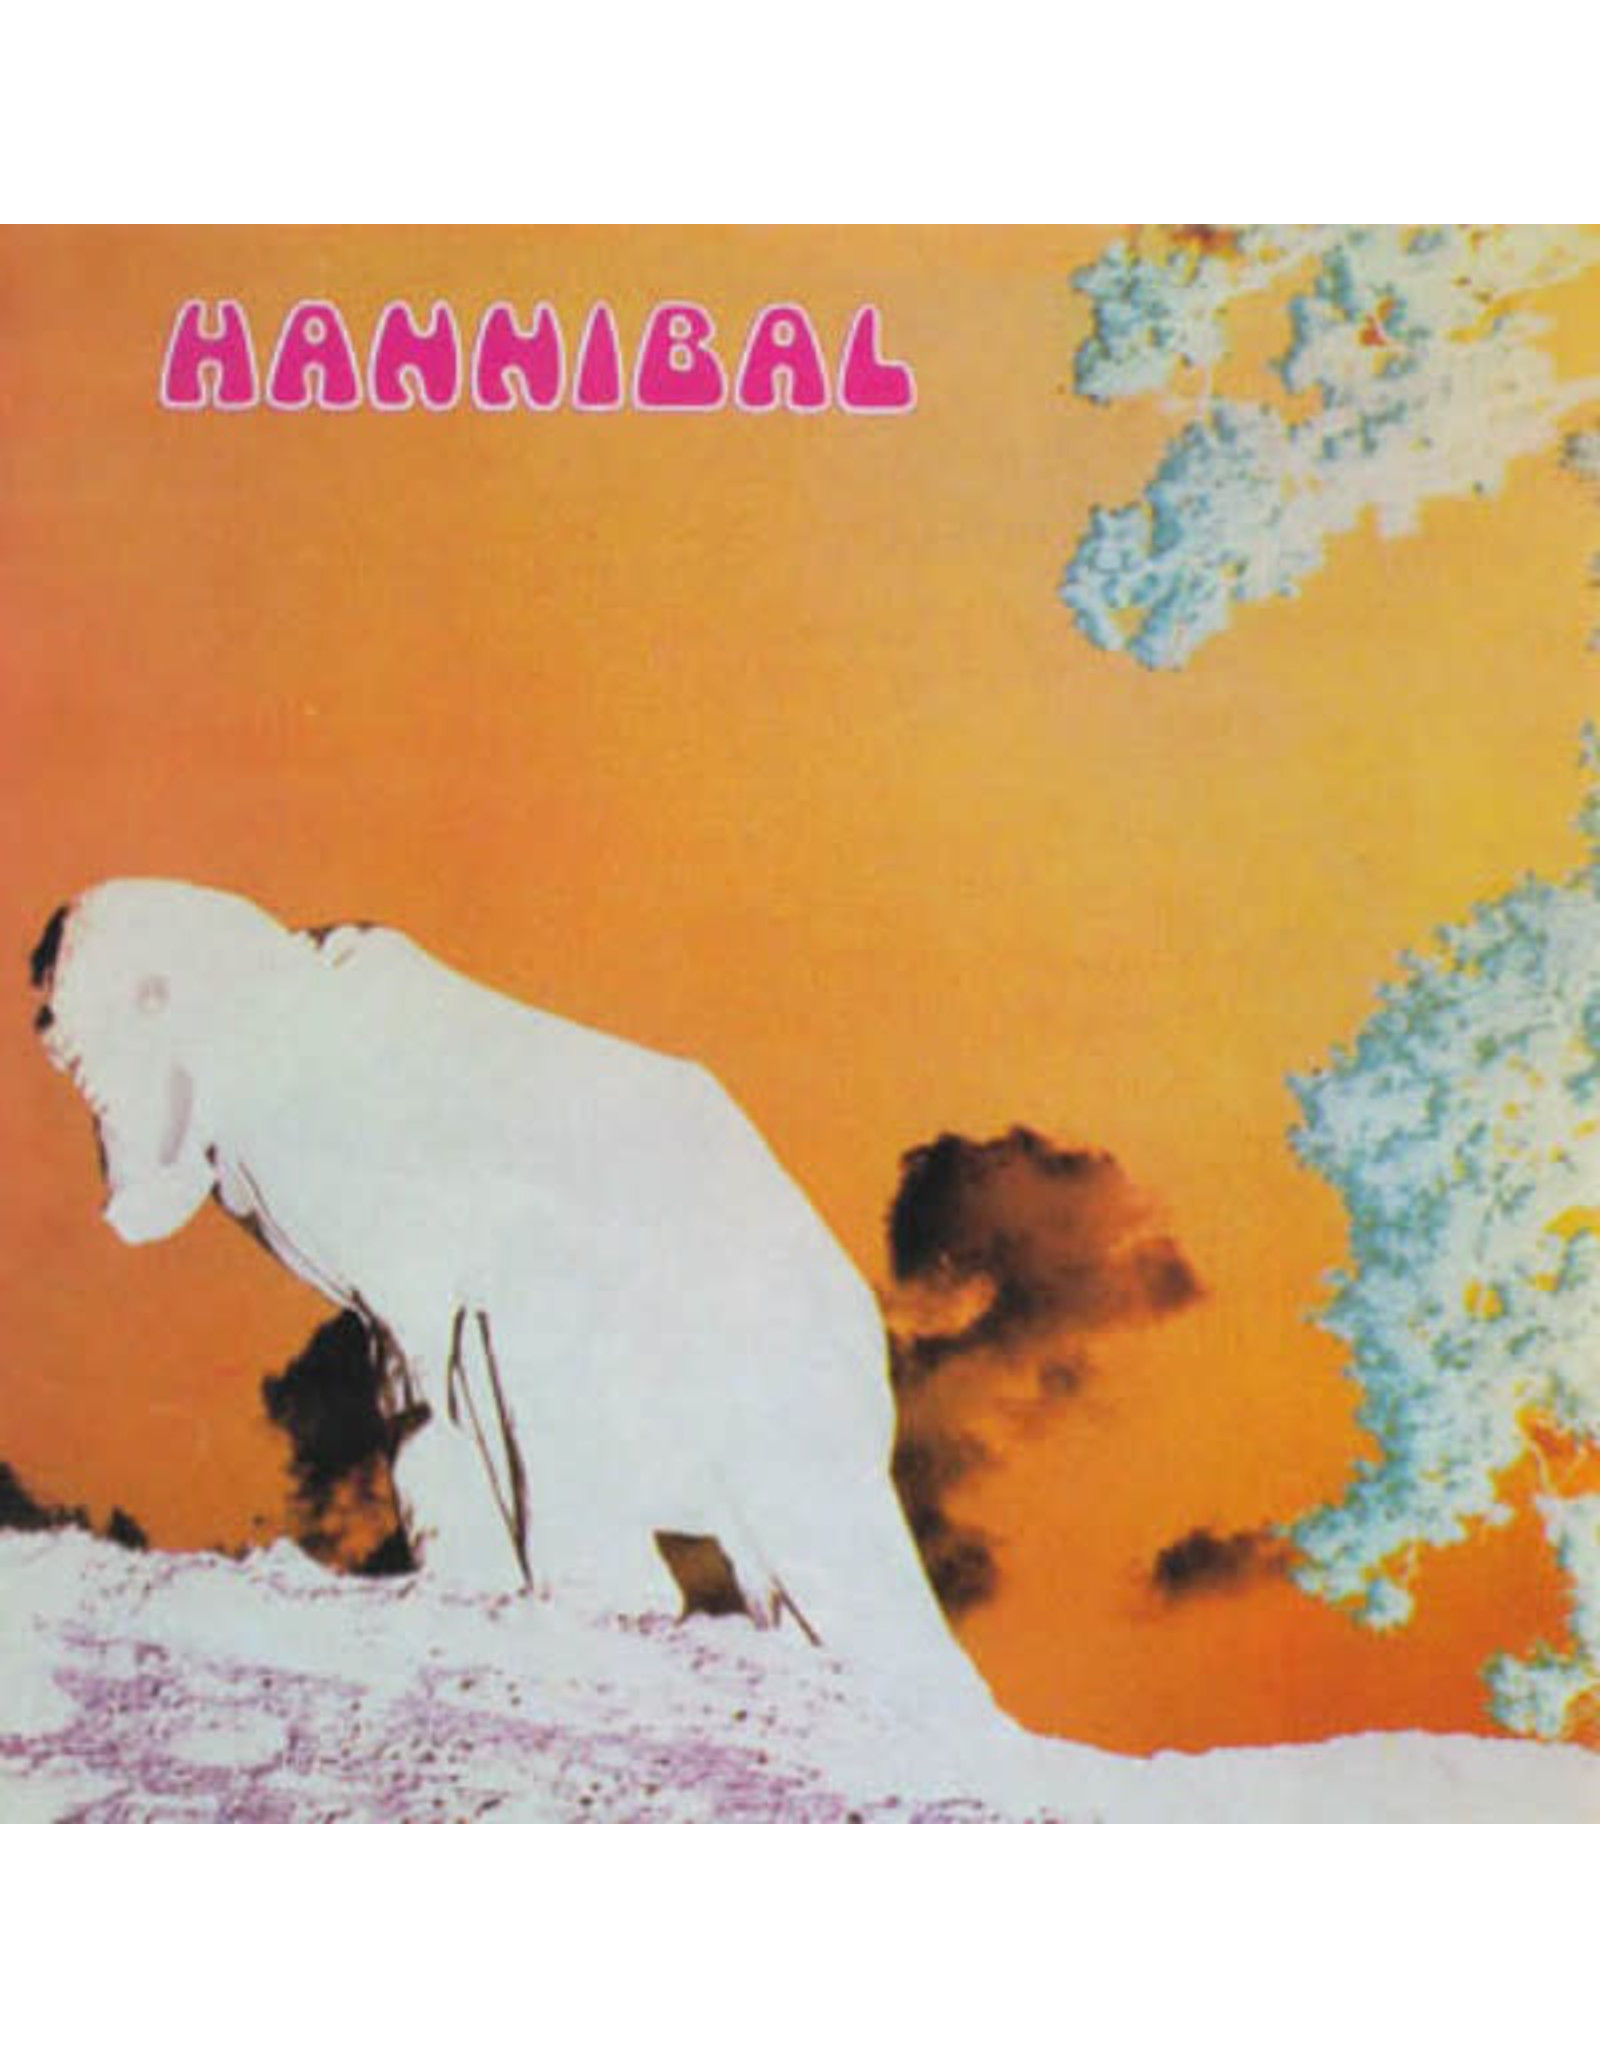 Vinyl Hannibal - ST.  Final Sale